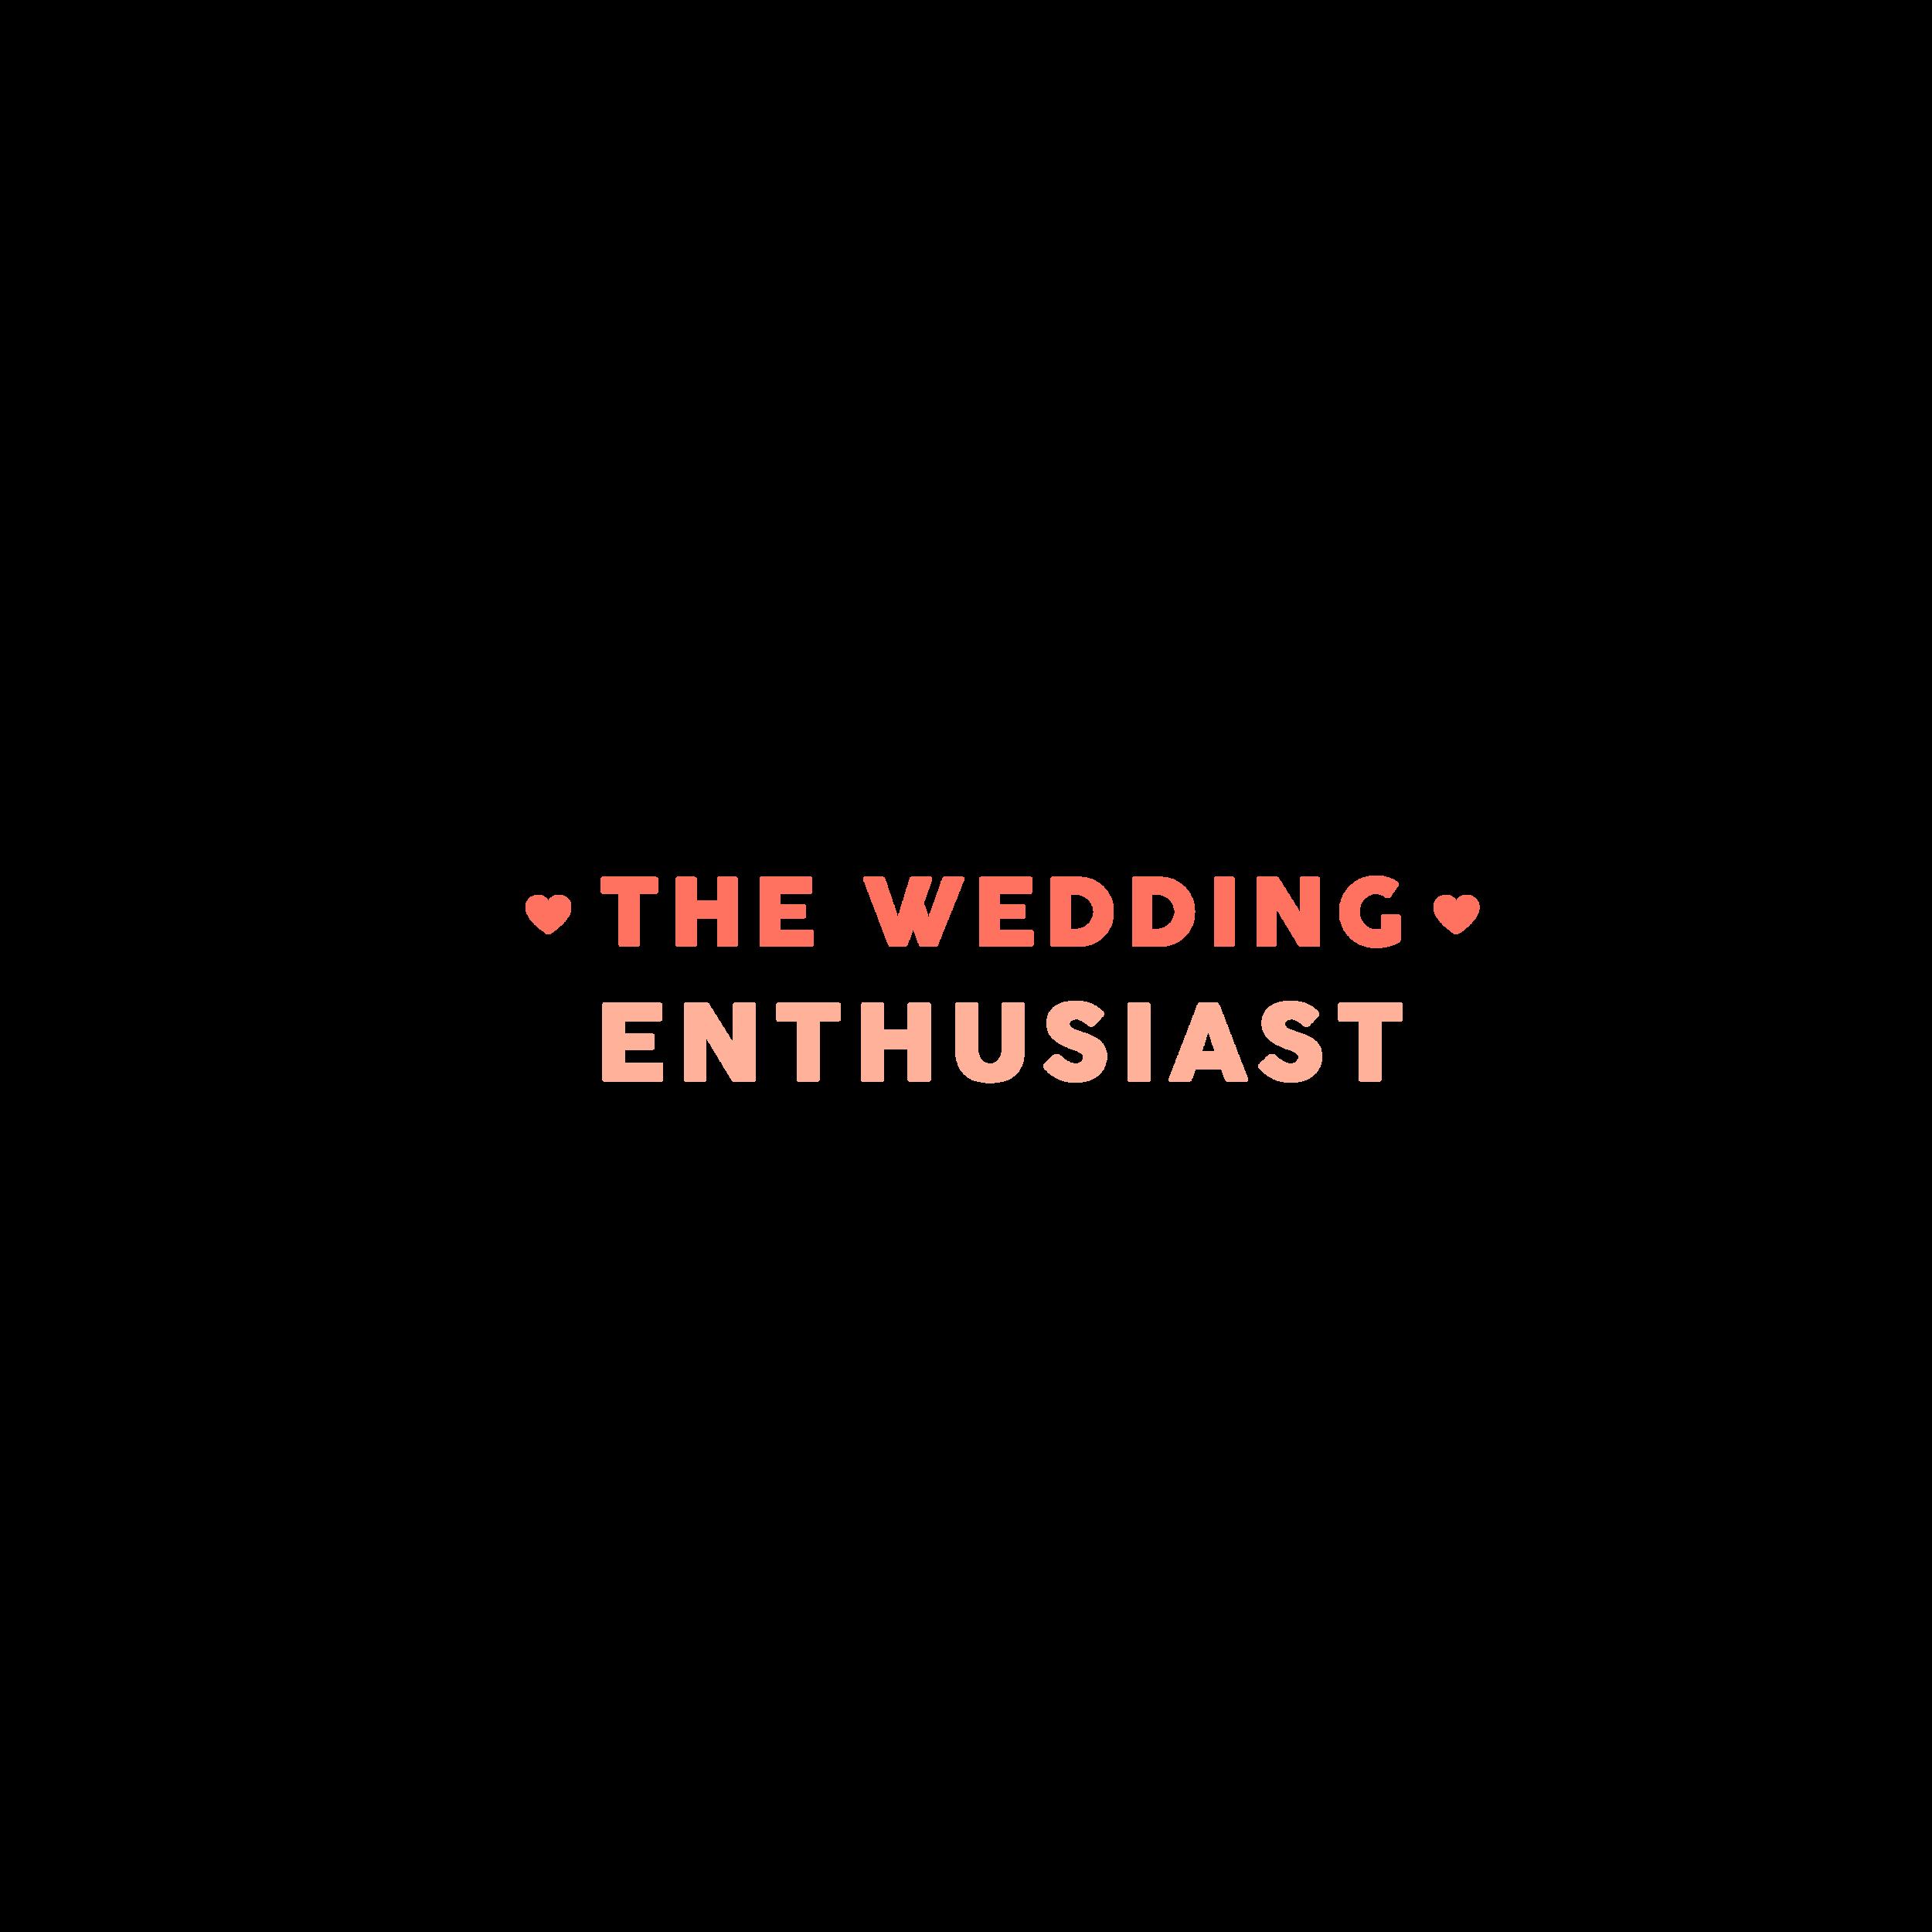 The Wedding Enthusiast